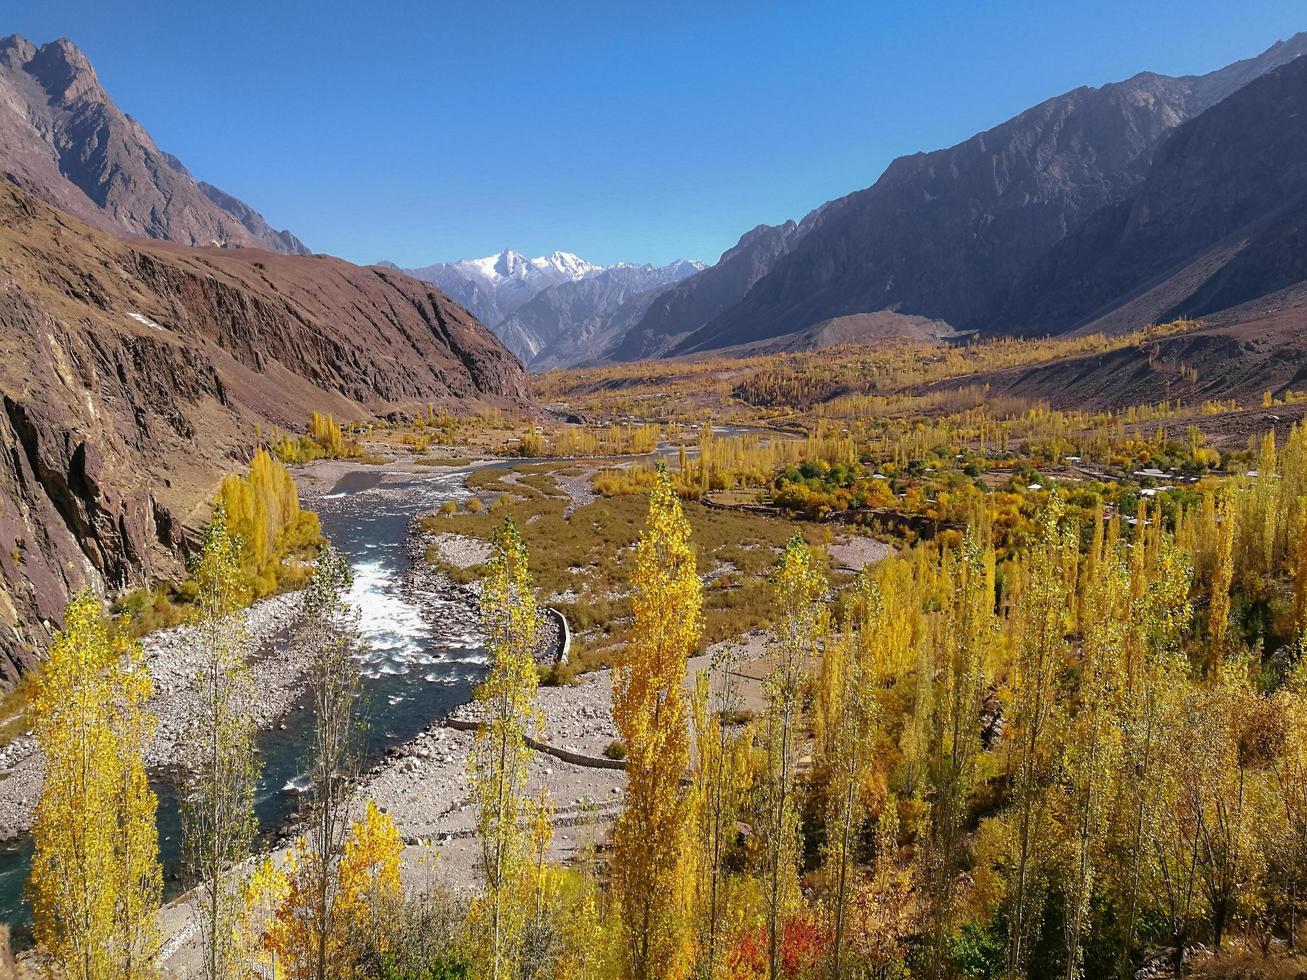 Gupis Valley in autumn photo